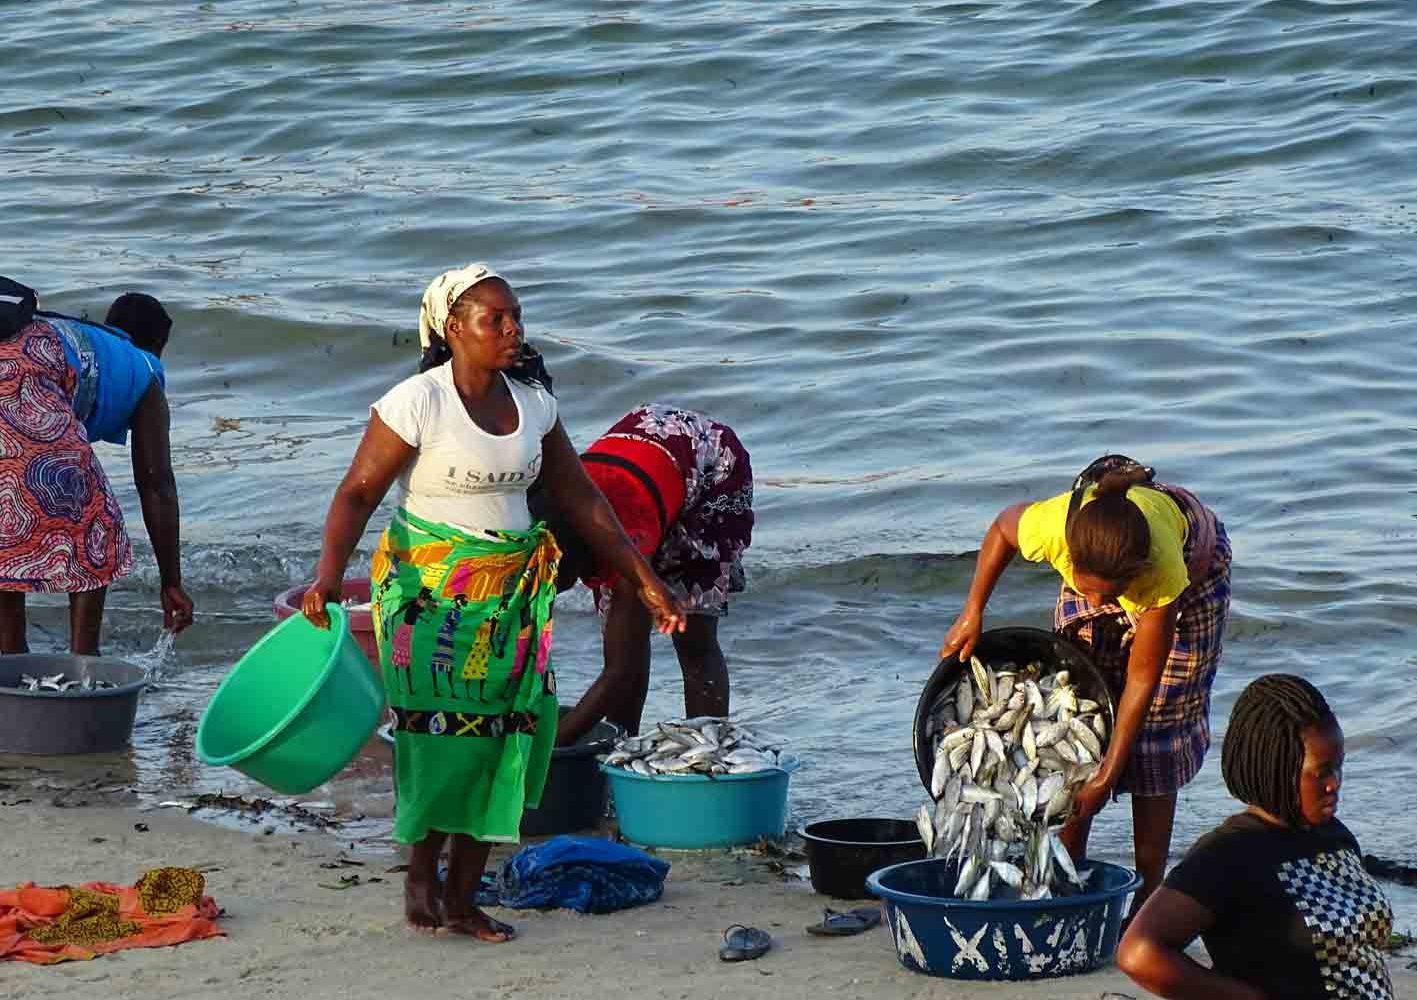 Fischfang, Vilanculos, Mozambique